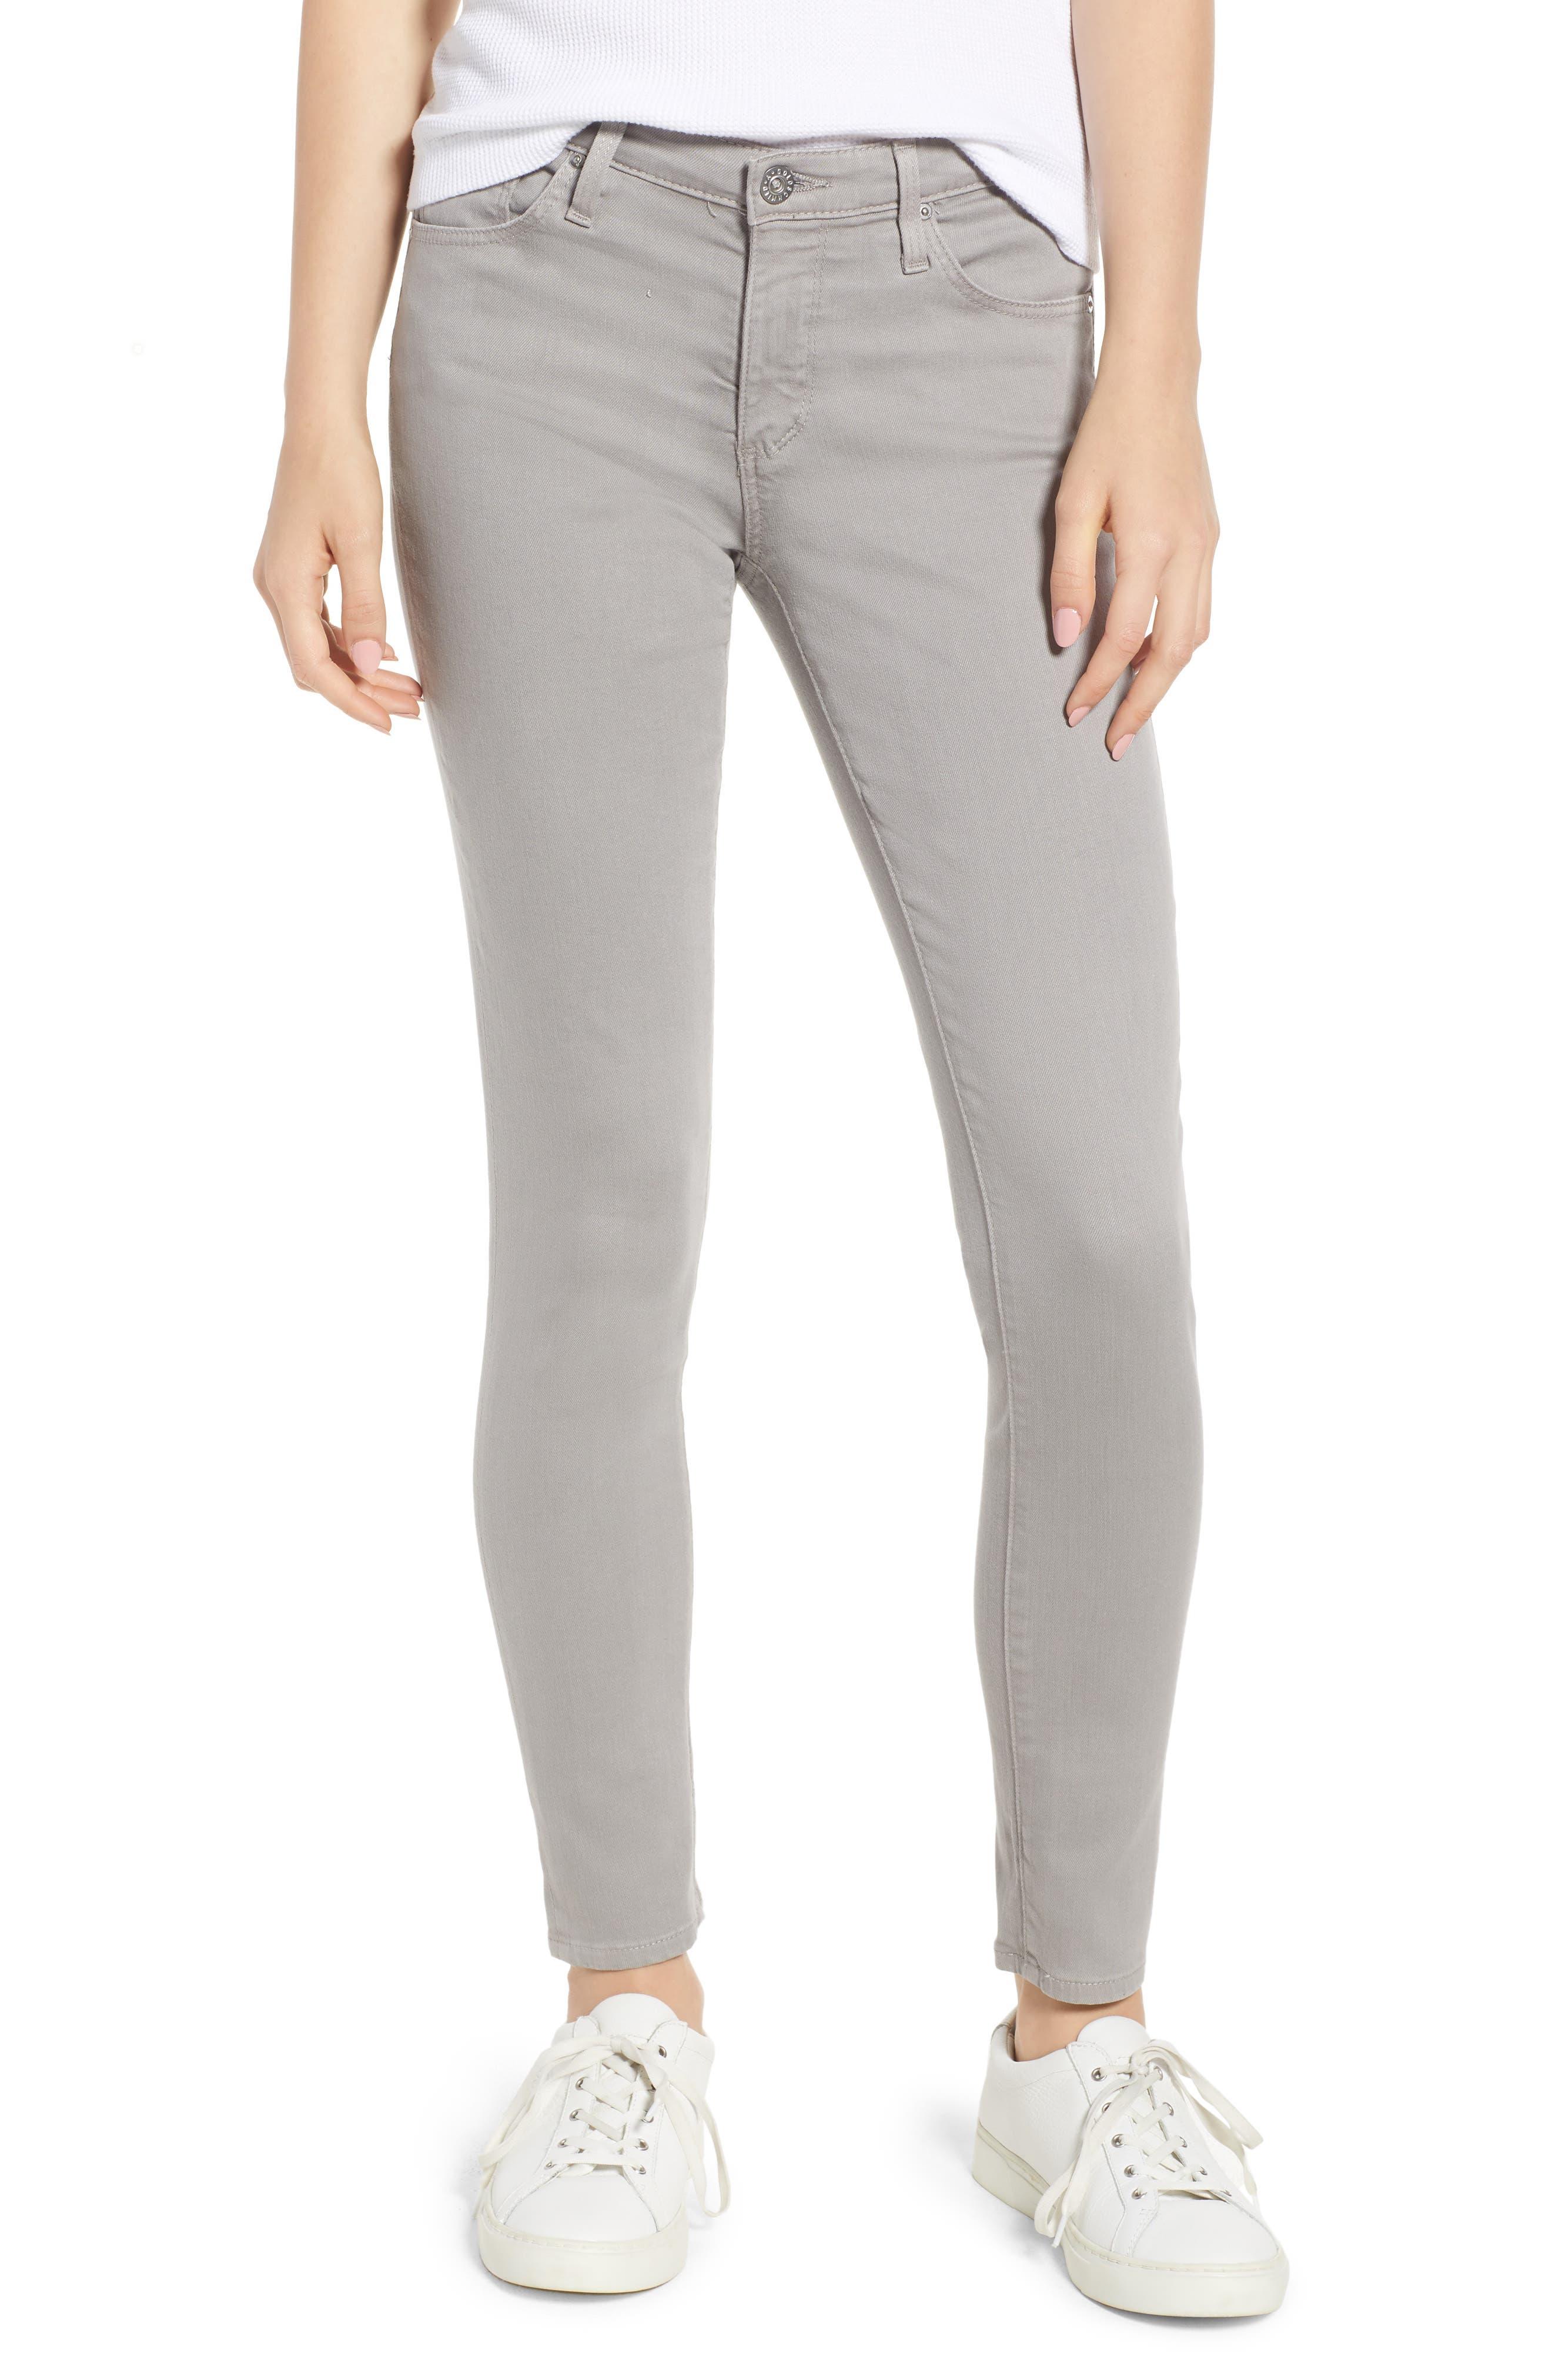 'The Legging' Ankle Jeans,                         Main,                         color, Sulfur Pebble Beach